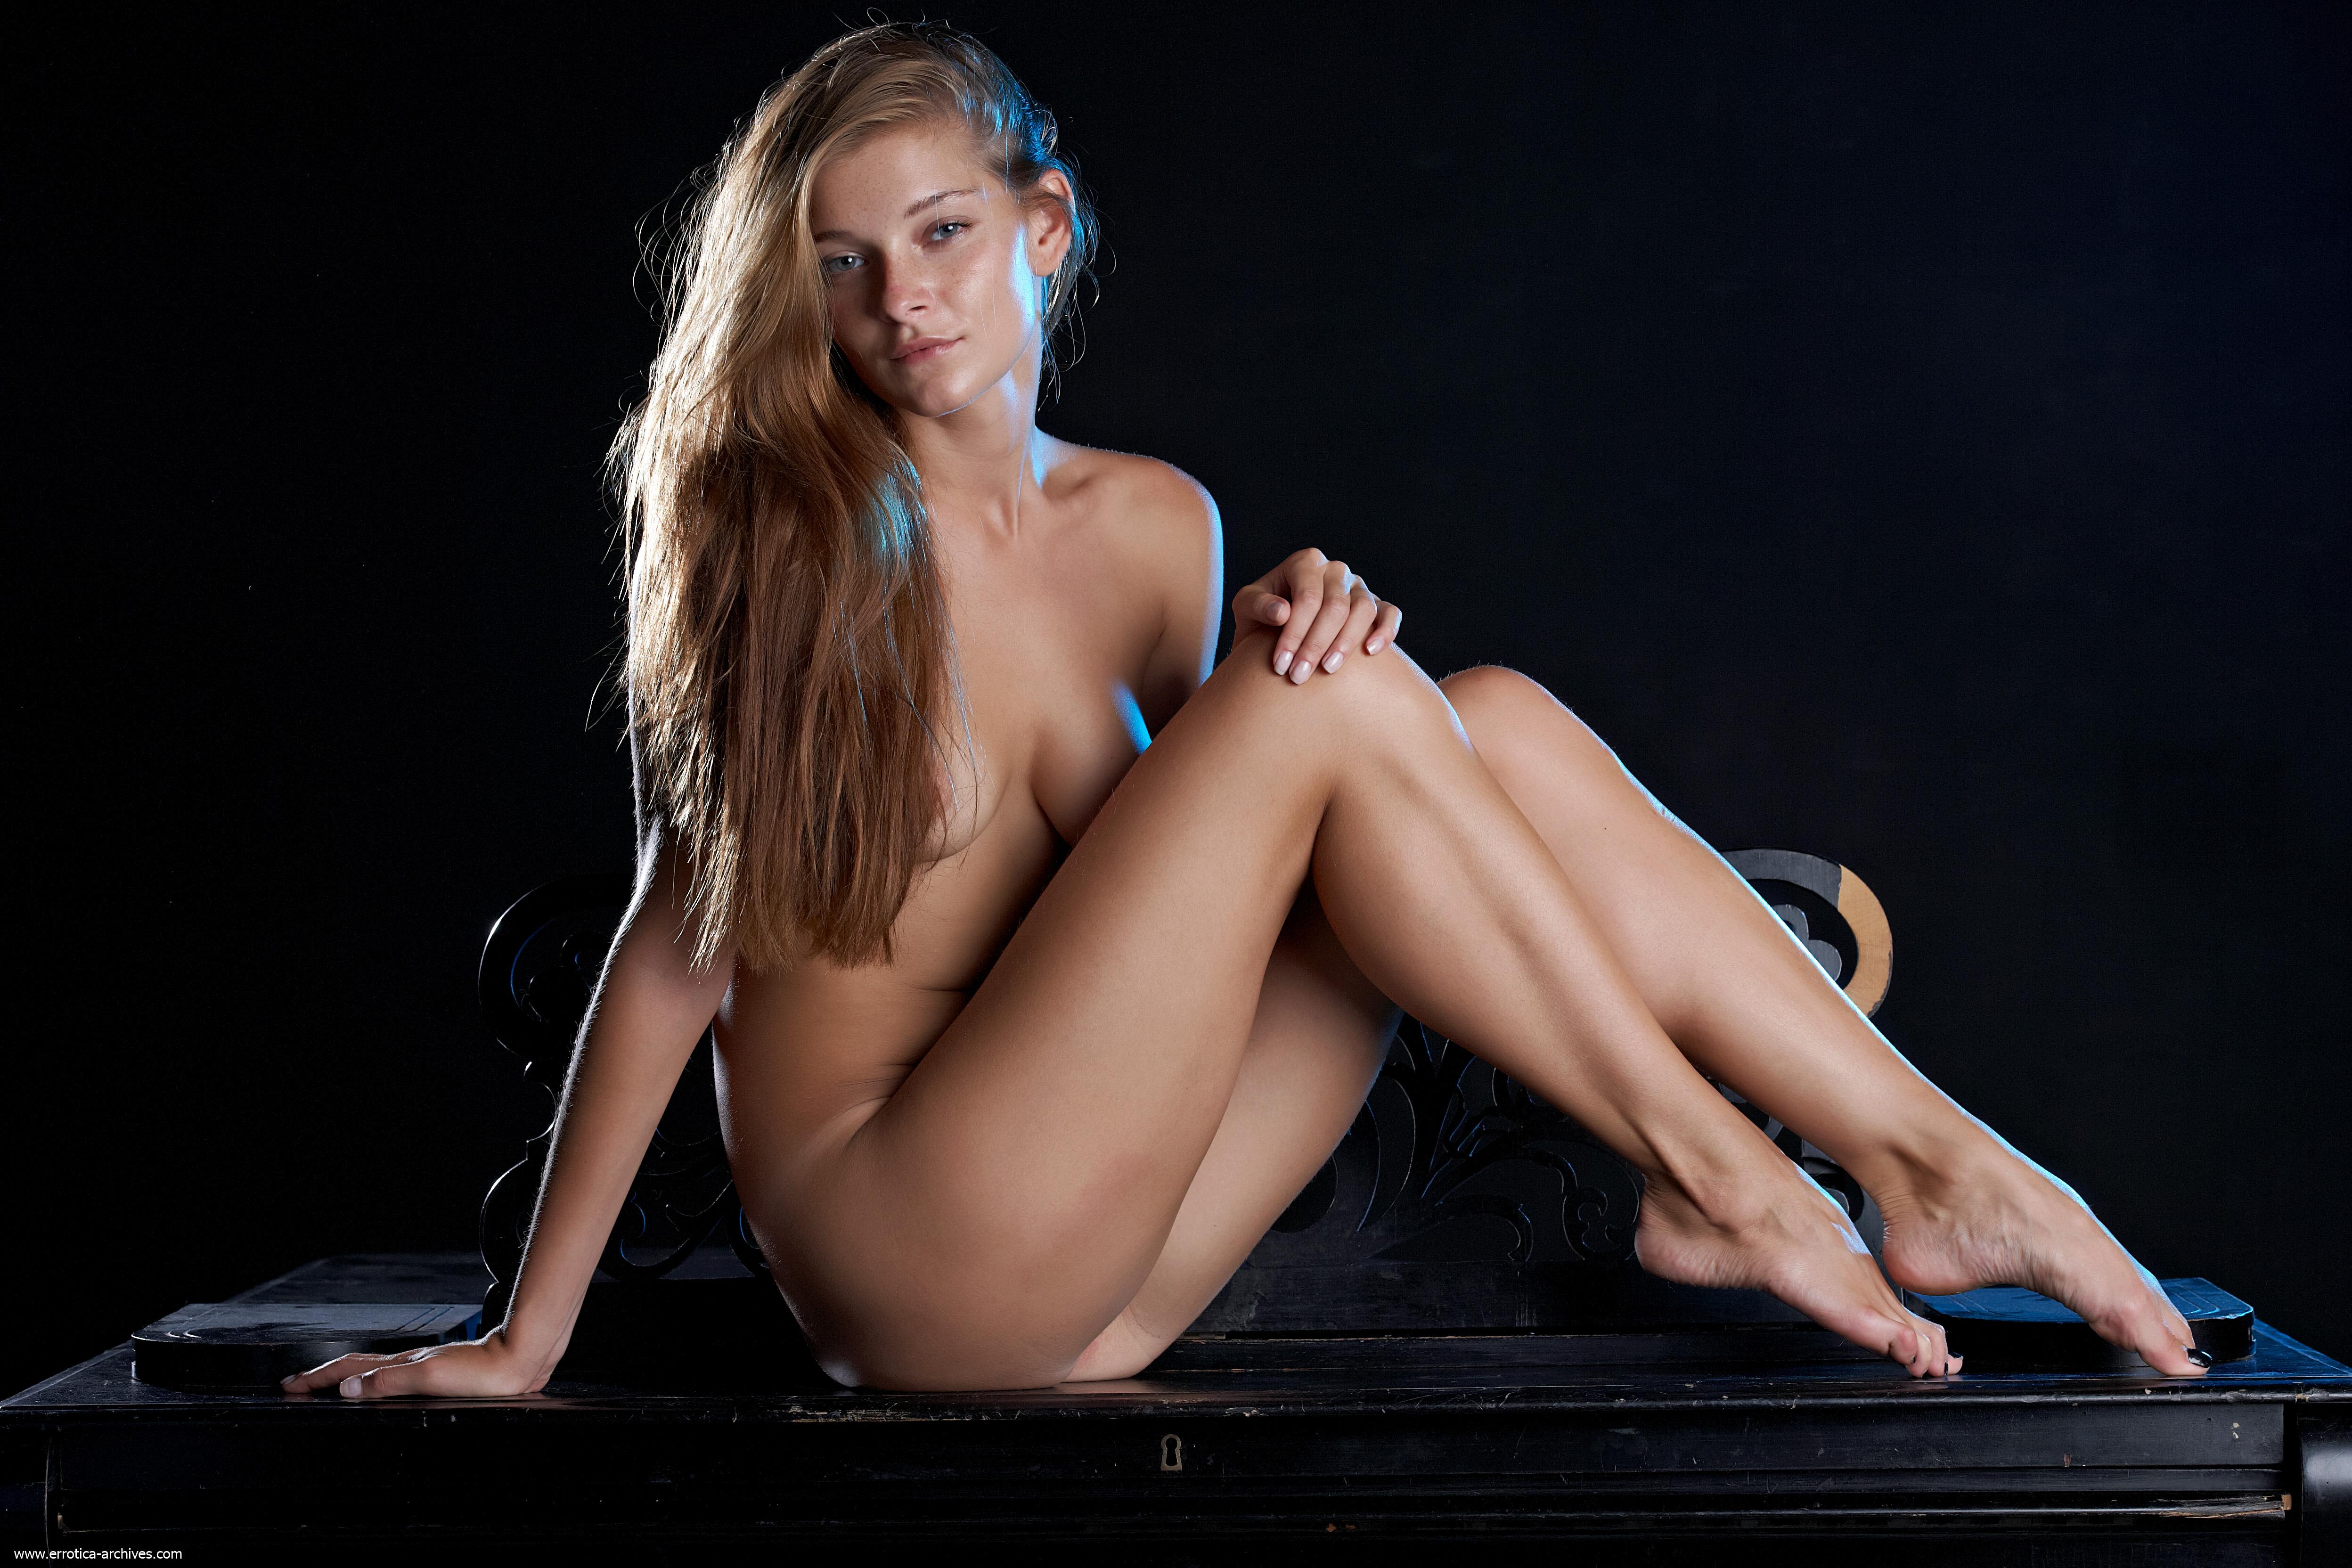 golaya-shpitsa-katerina-foto